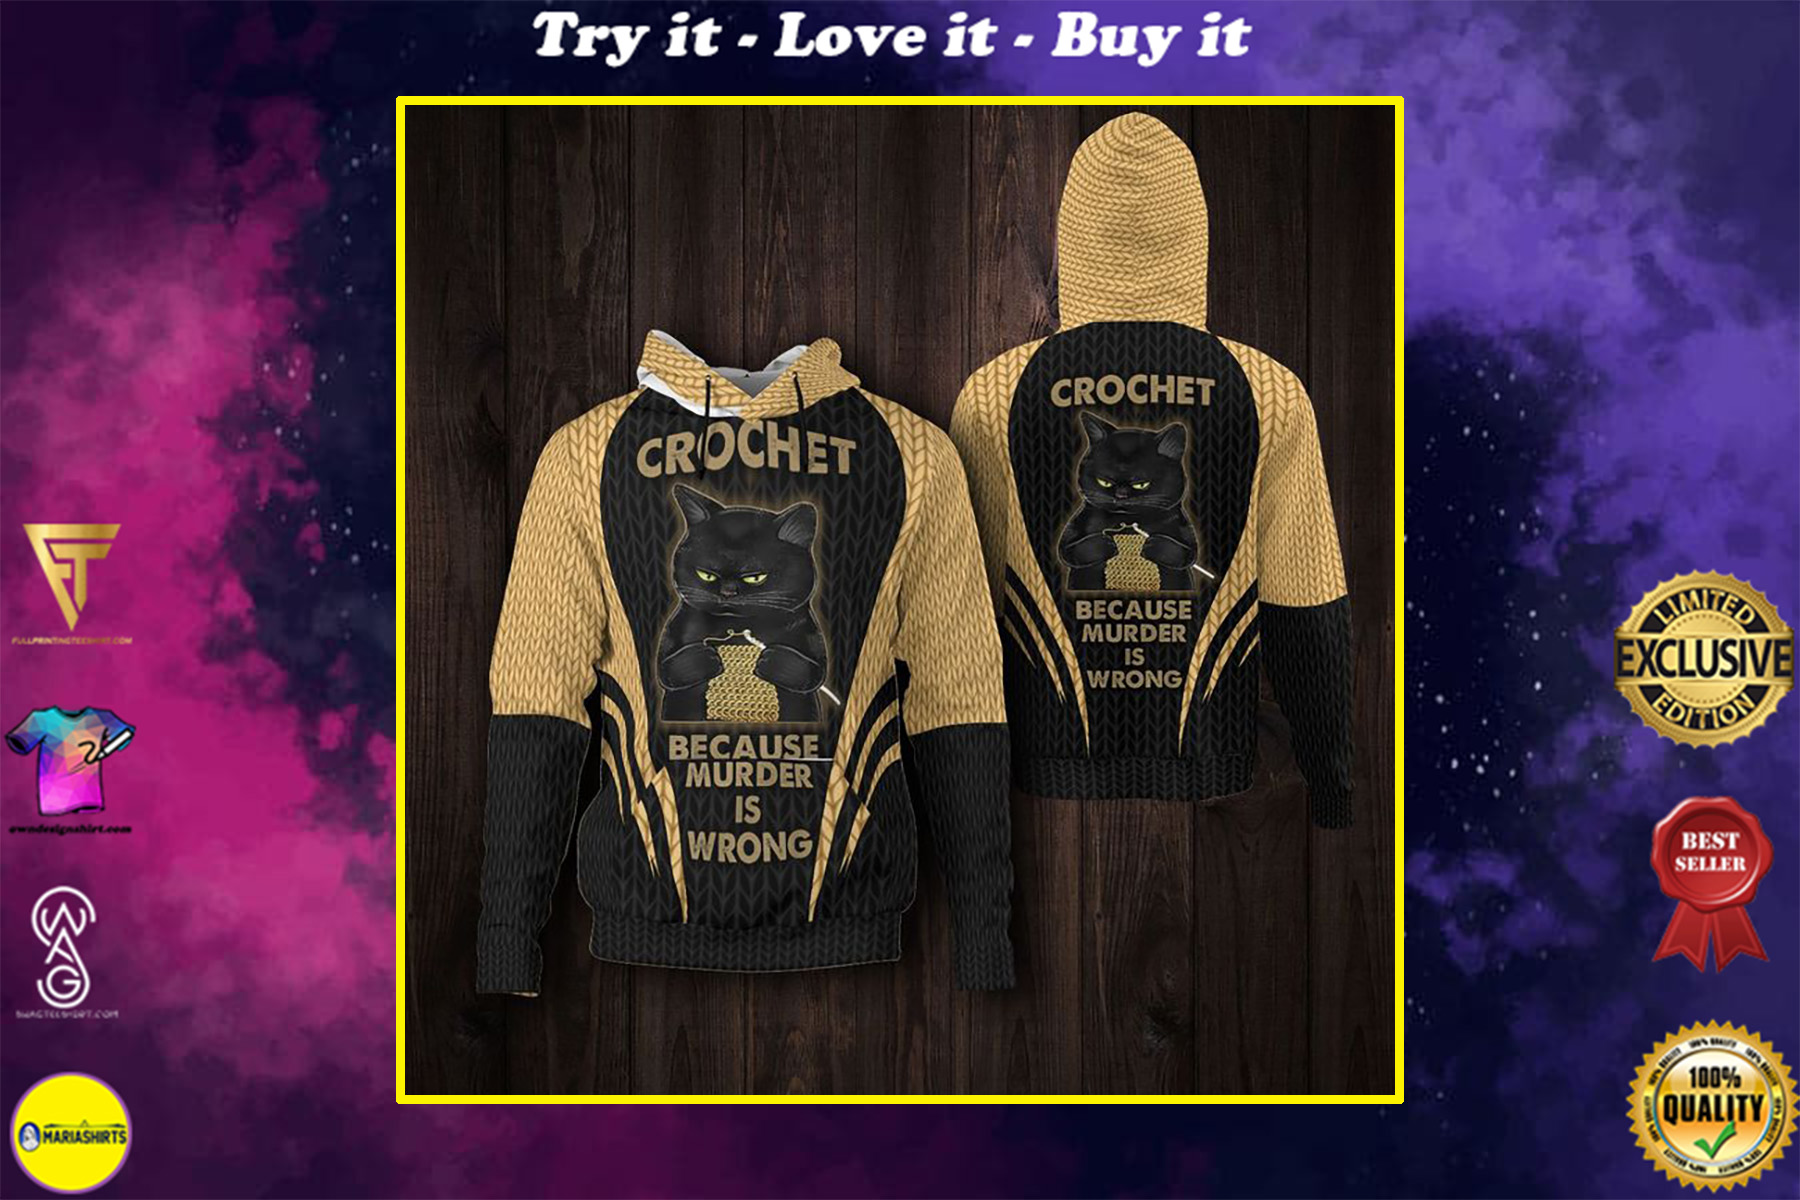 black cat crochet because murder is wrong full printing shirt